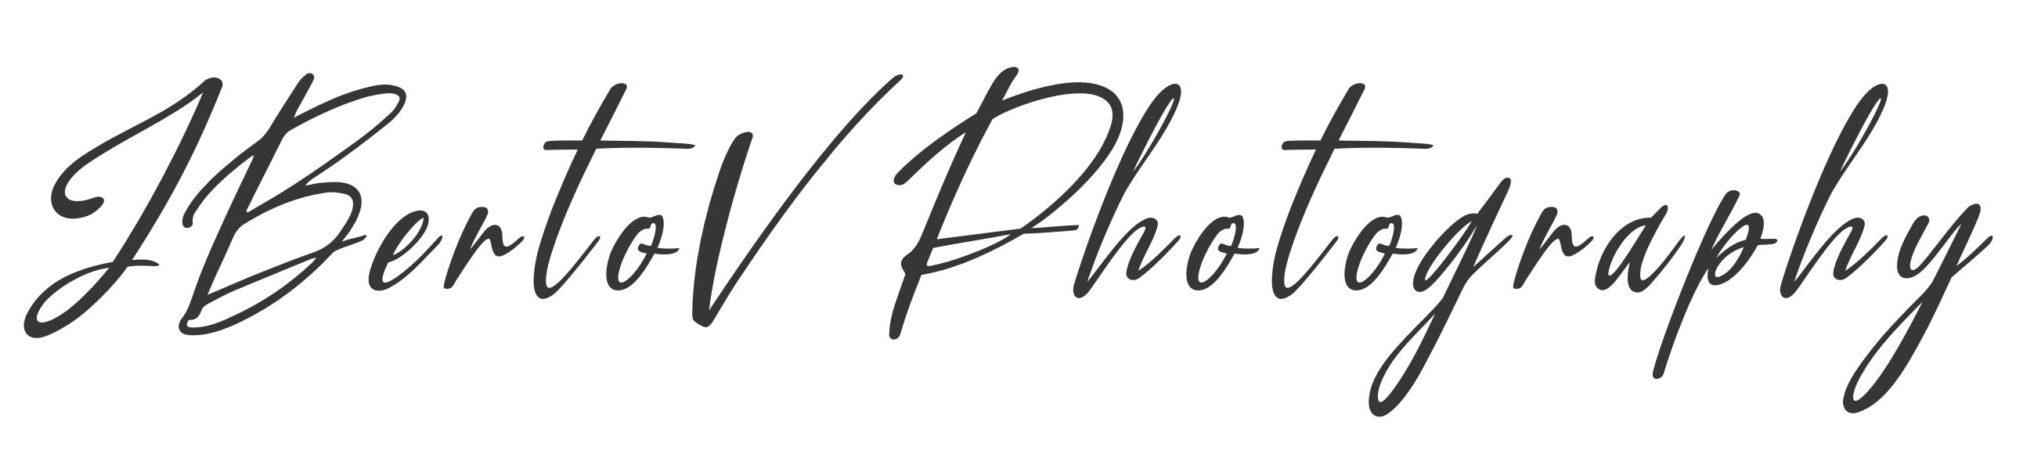 JBertoV Photography